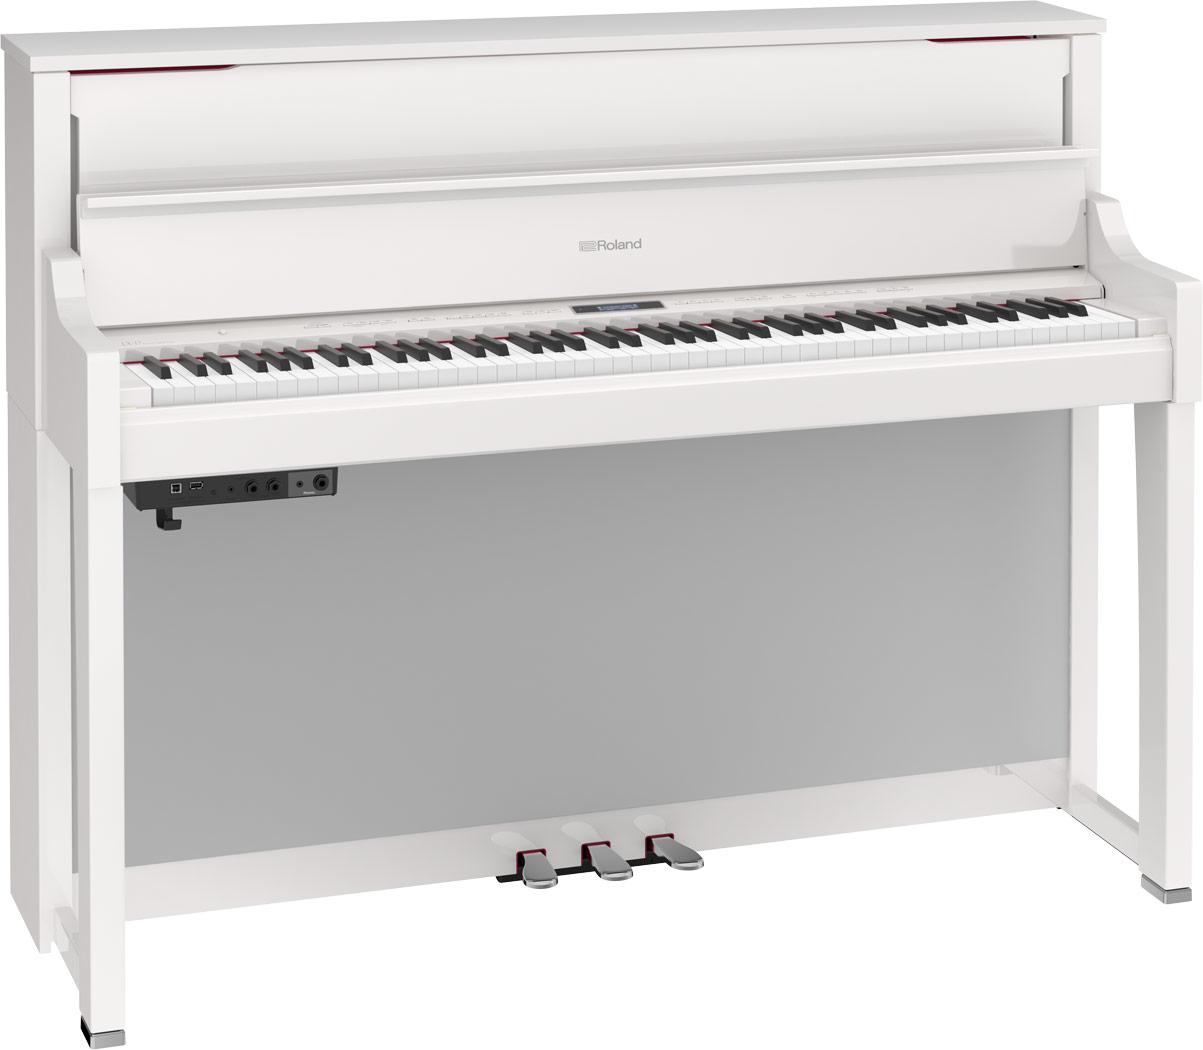 Roland - LX-17 | Digital Piano